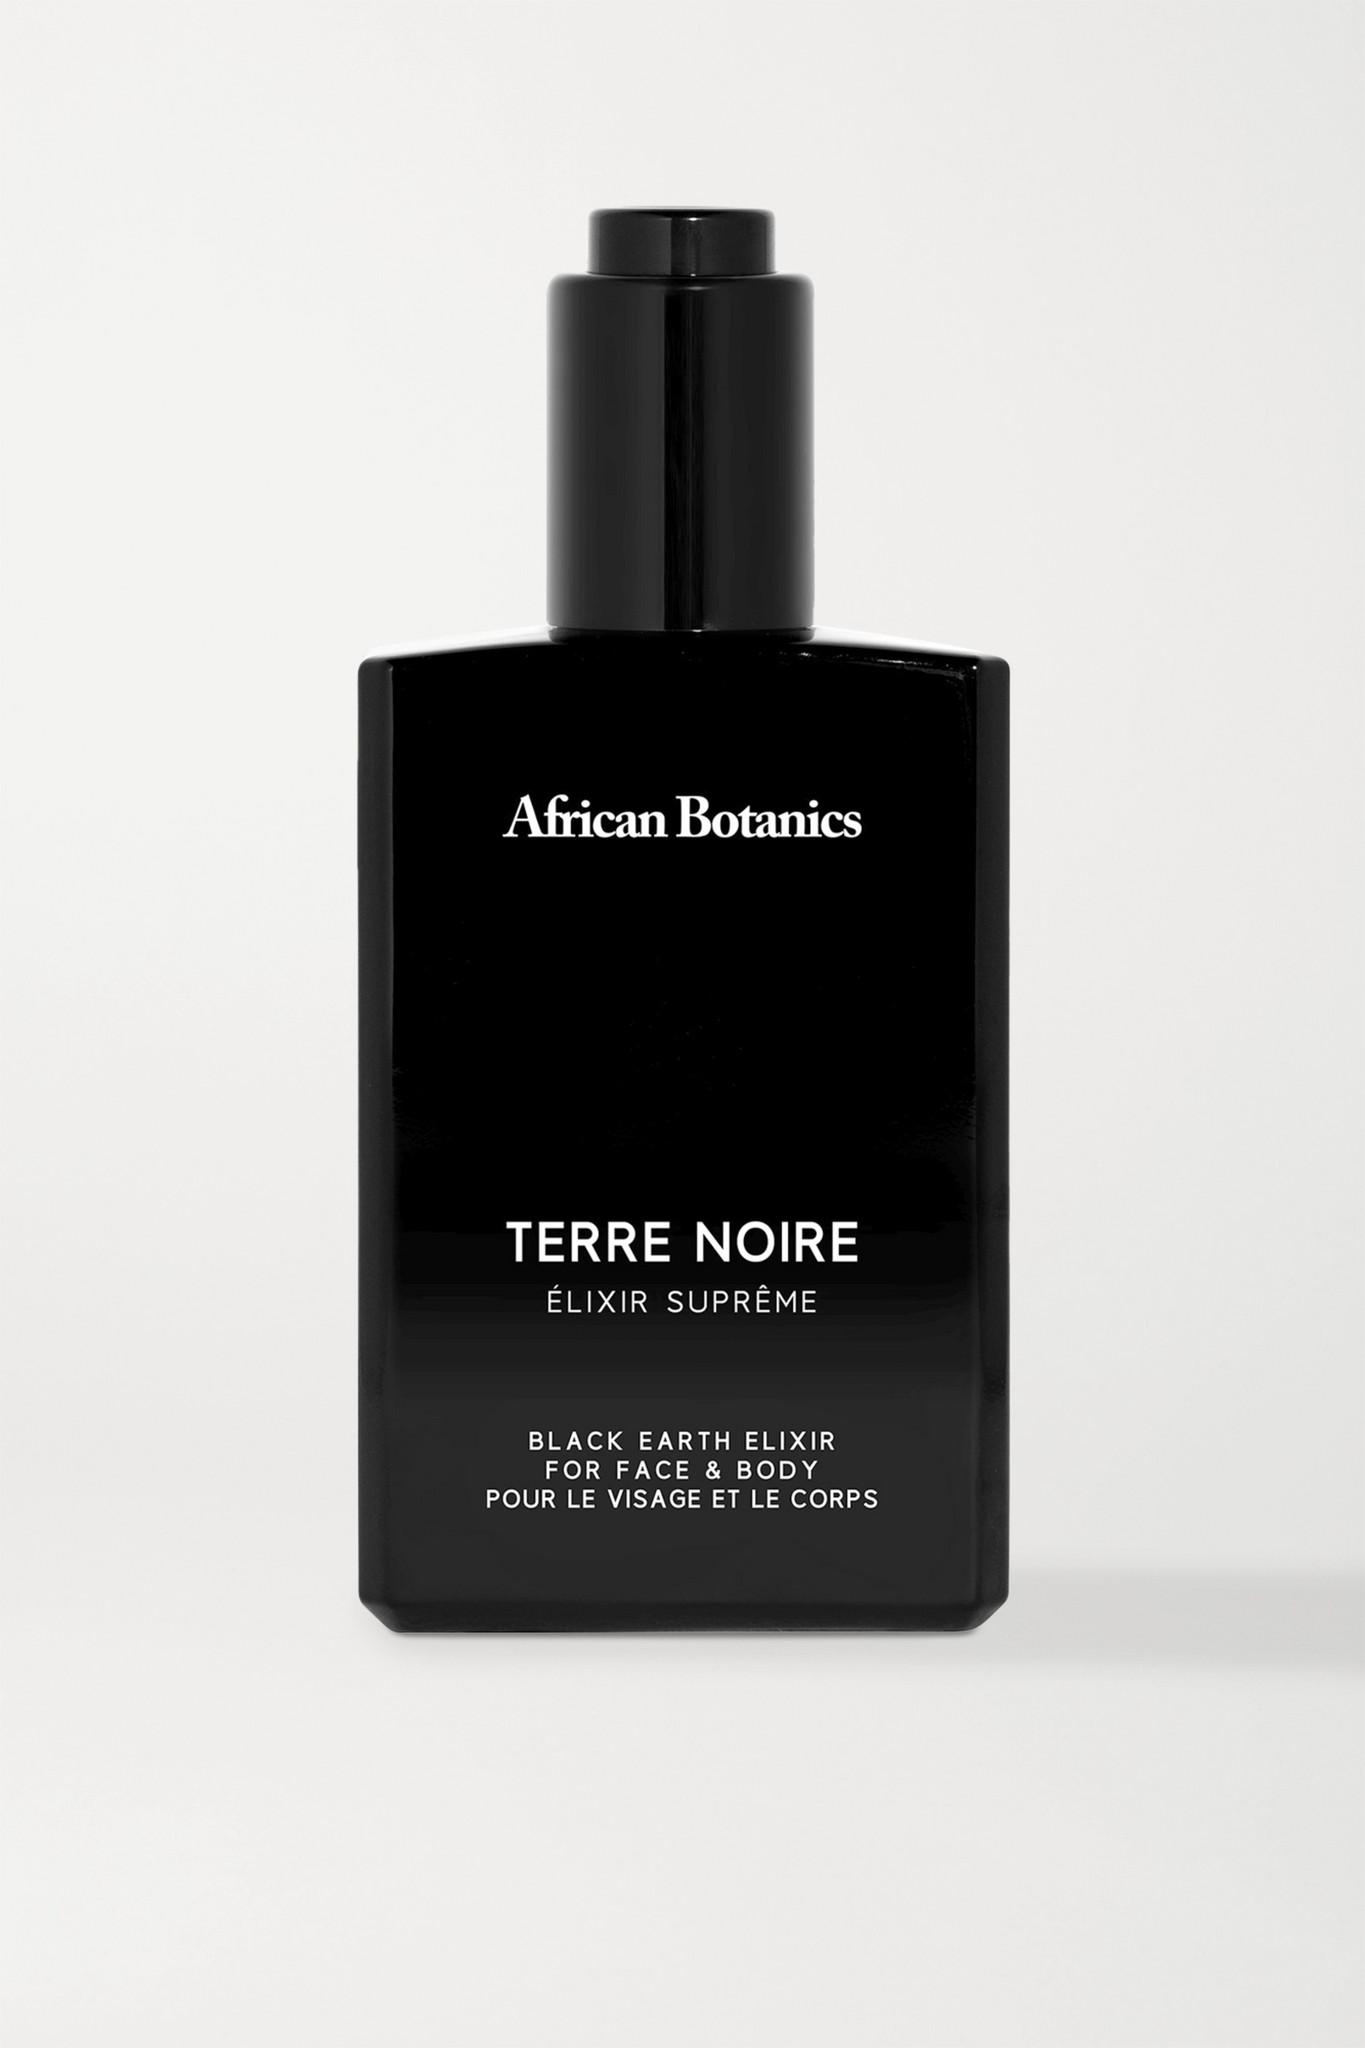 AFRICAN BOTANICS - Terre Noire Elixir Supreme, 100ml - one size